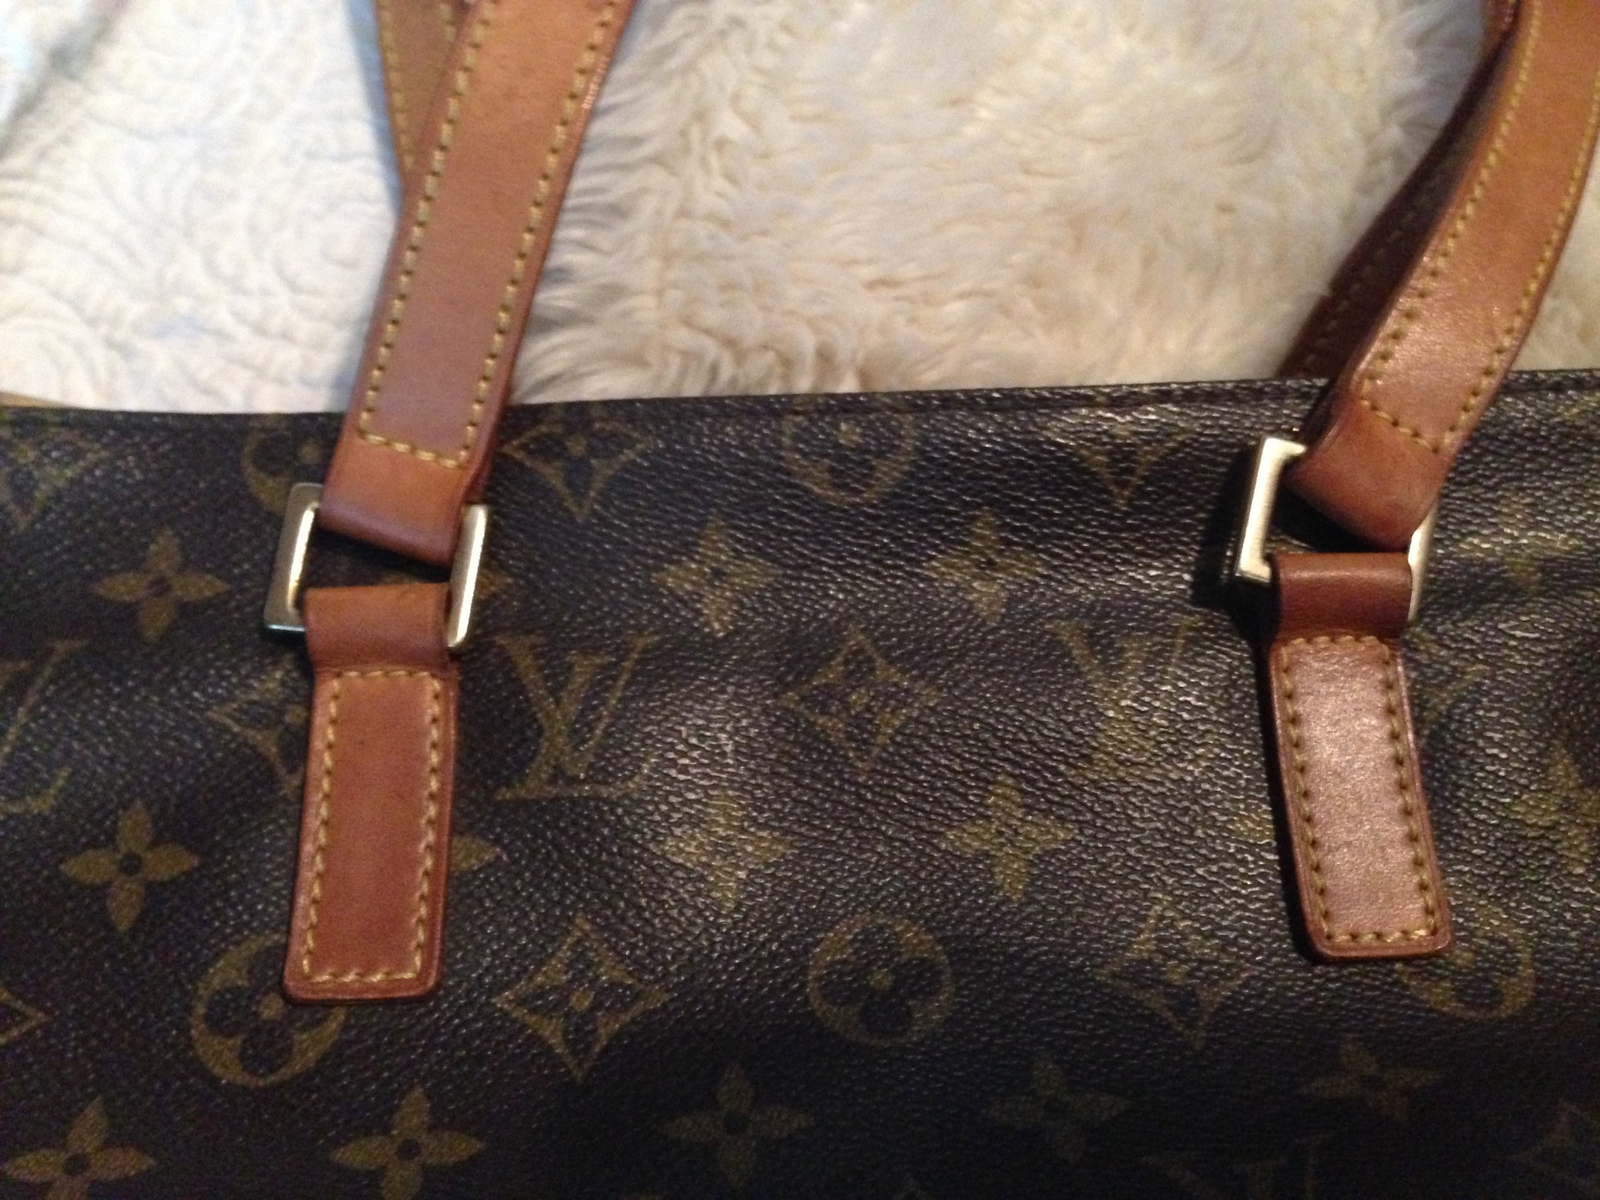 Louis Vuitton Tote Bag  - Piano